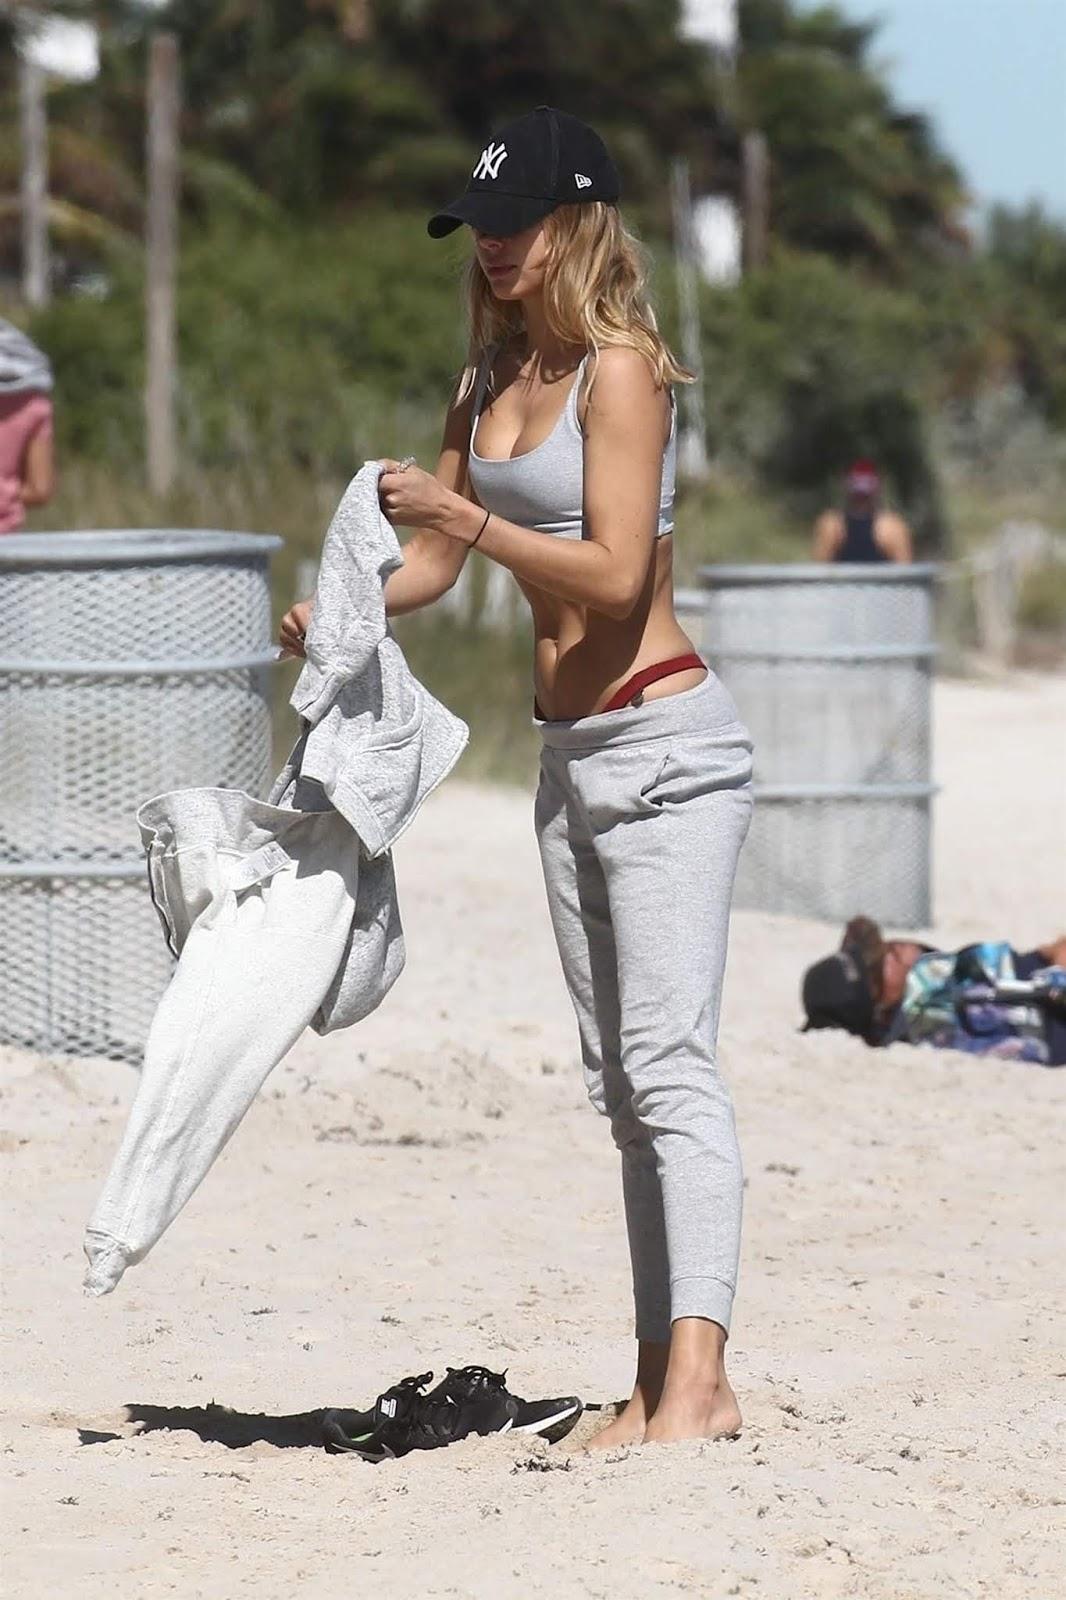 Kimberley Garner in a bikini at the beach in Miami - 01/28/2019